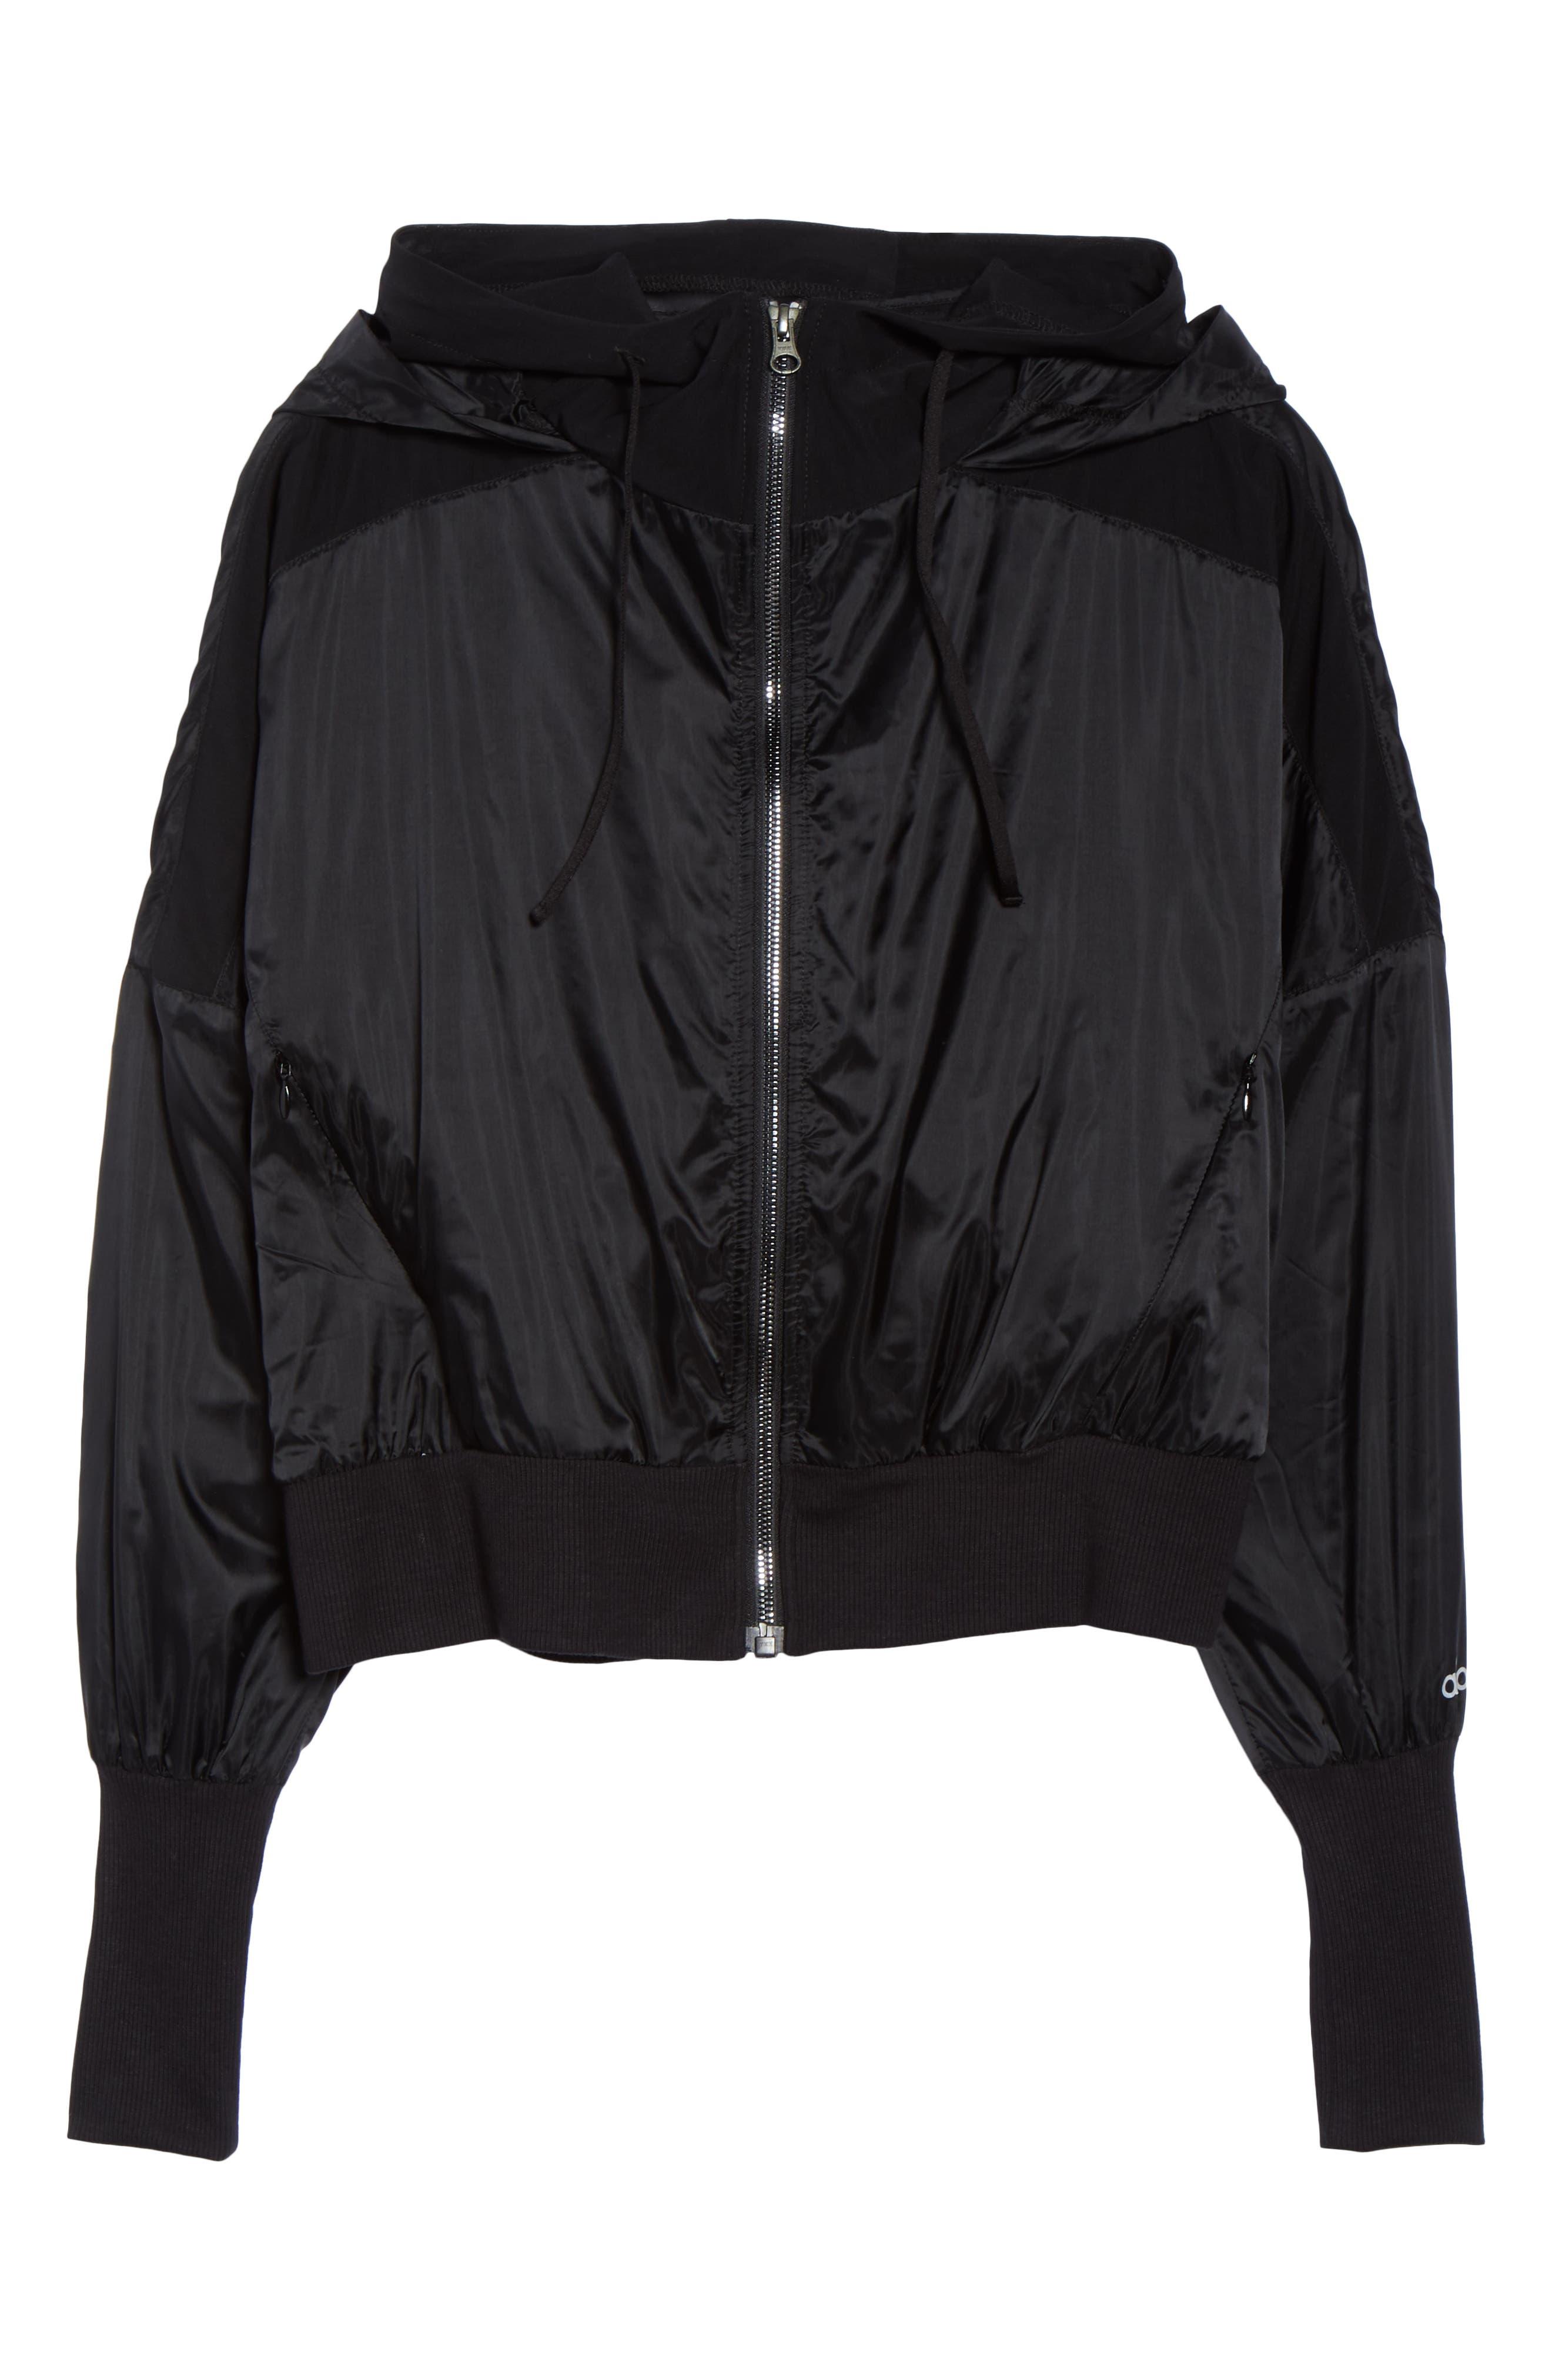 Aqua Jacket,                             Alternate thumbnail 6, color,                             BLACK